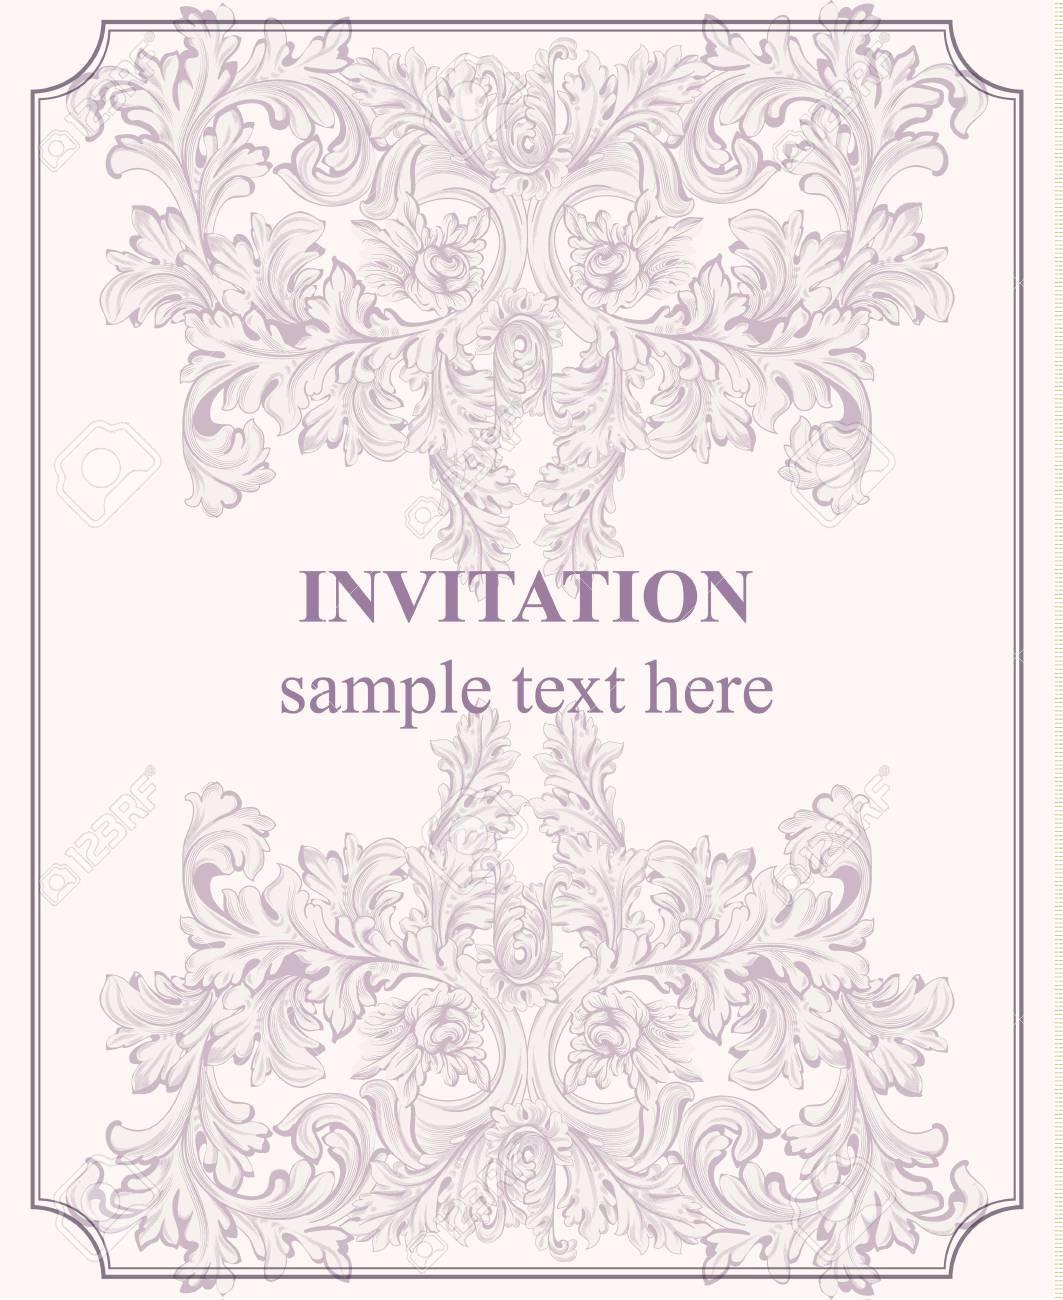 Luxury invitation card vector royal victorian pattern ornament luxury invitation card vector royal victorian pattern ornament pale lavender color stock vector stopboris Images